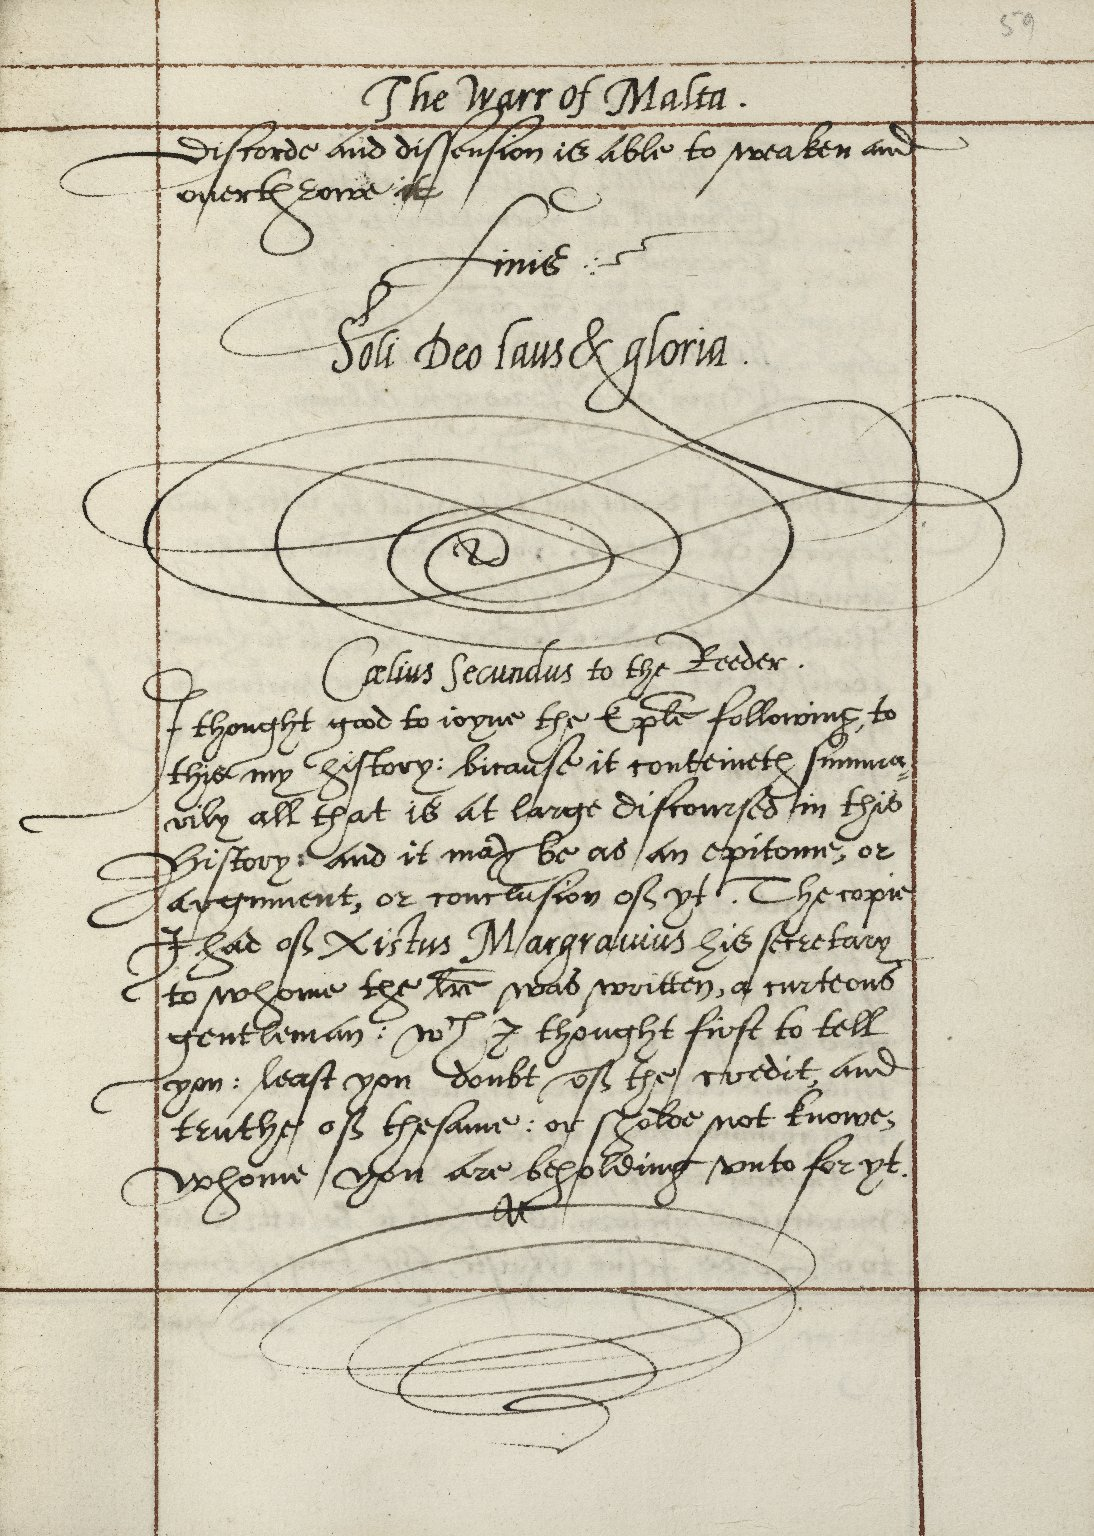 Caelivs Secvndi Durio his historie of the warr of Malta